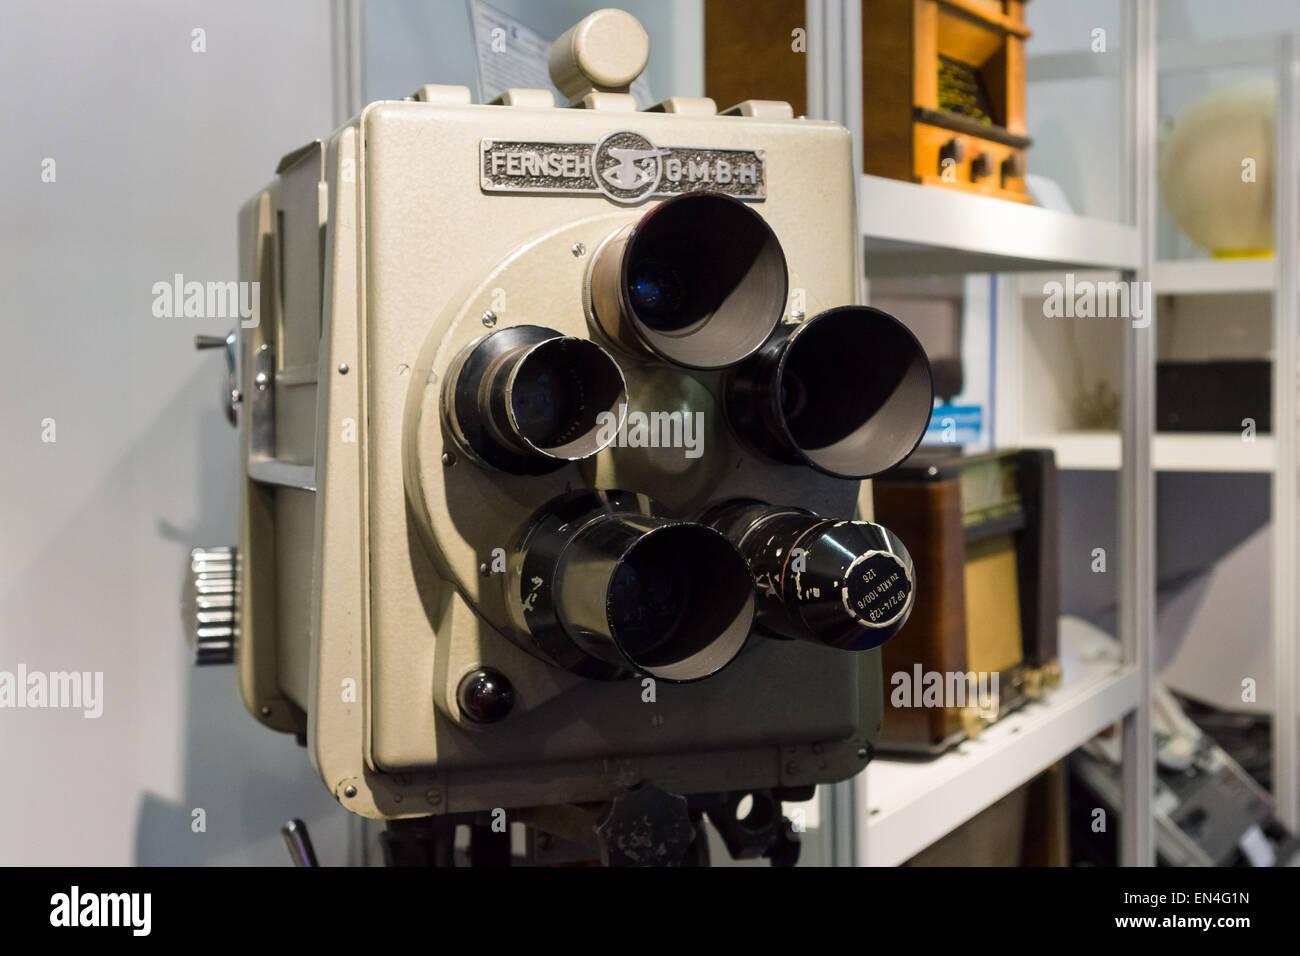 Fernseh GmbH, FS-Kamera Mit Rieselikonoskop, KK-Je 100 des KJA 125, 1957 Stockbild